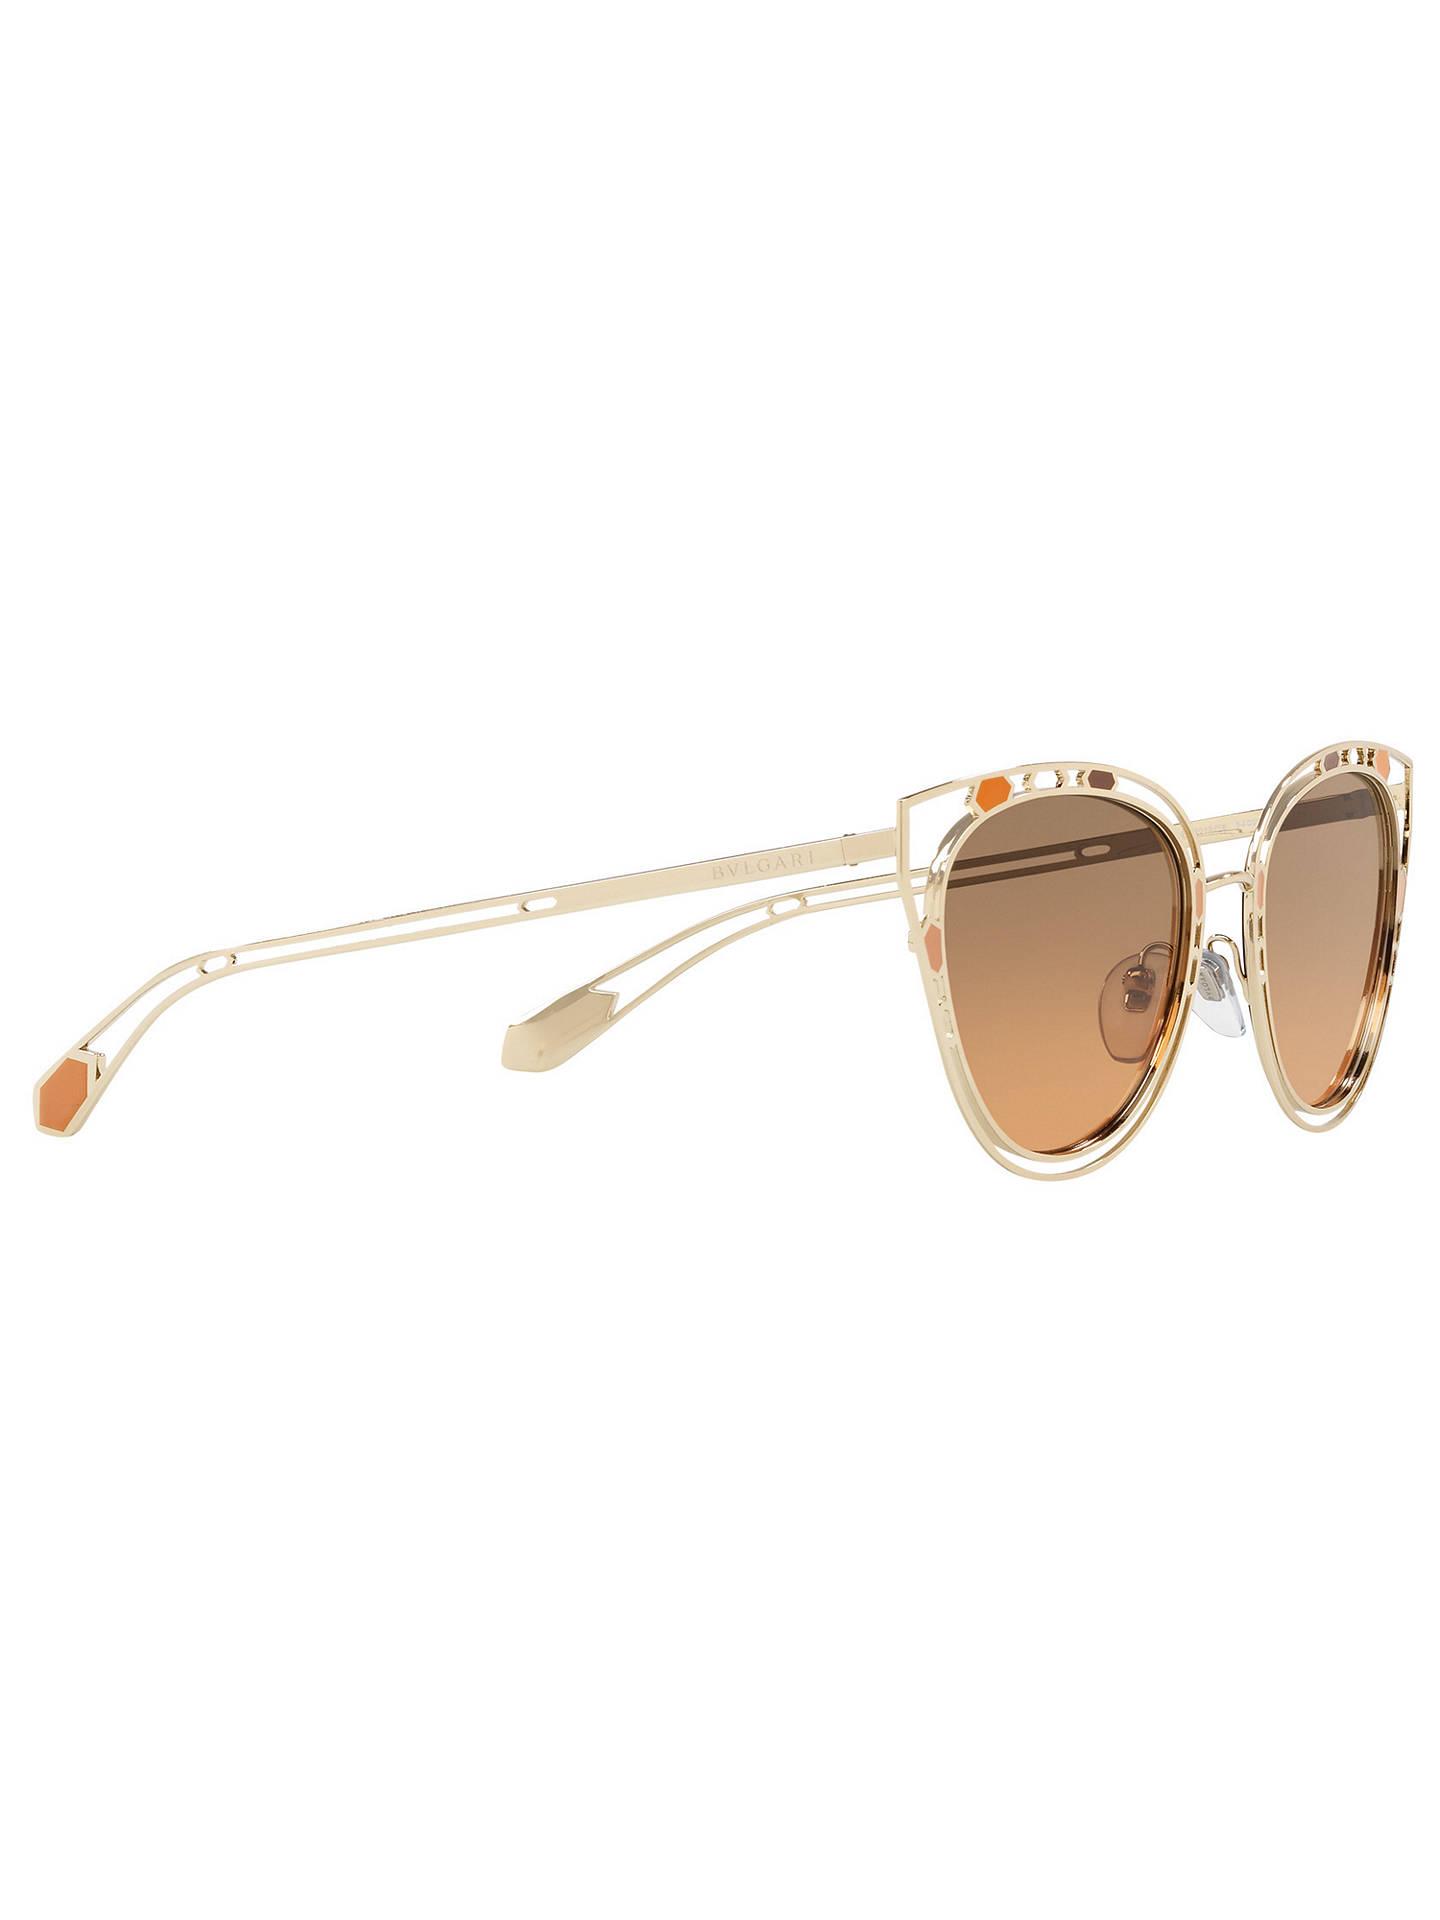 9c654baf522 ... BuyBVLGARI BV6104 Women s Cat s Eyes Sunglasses